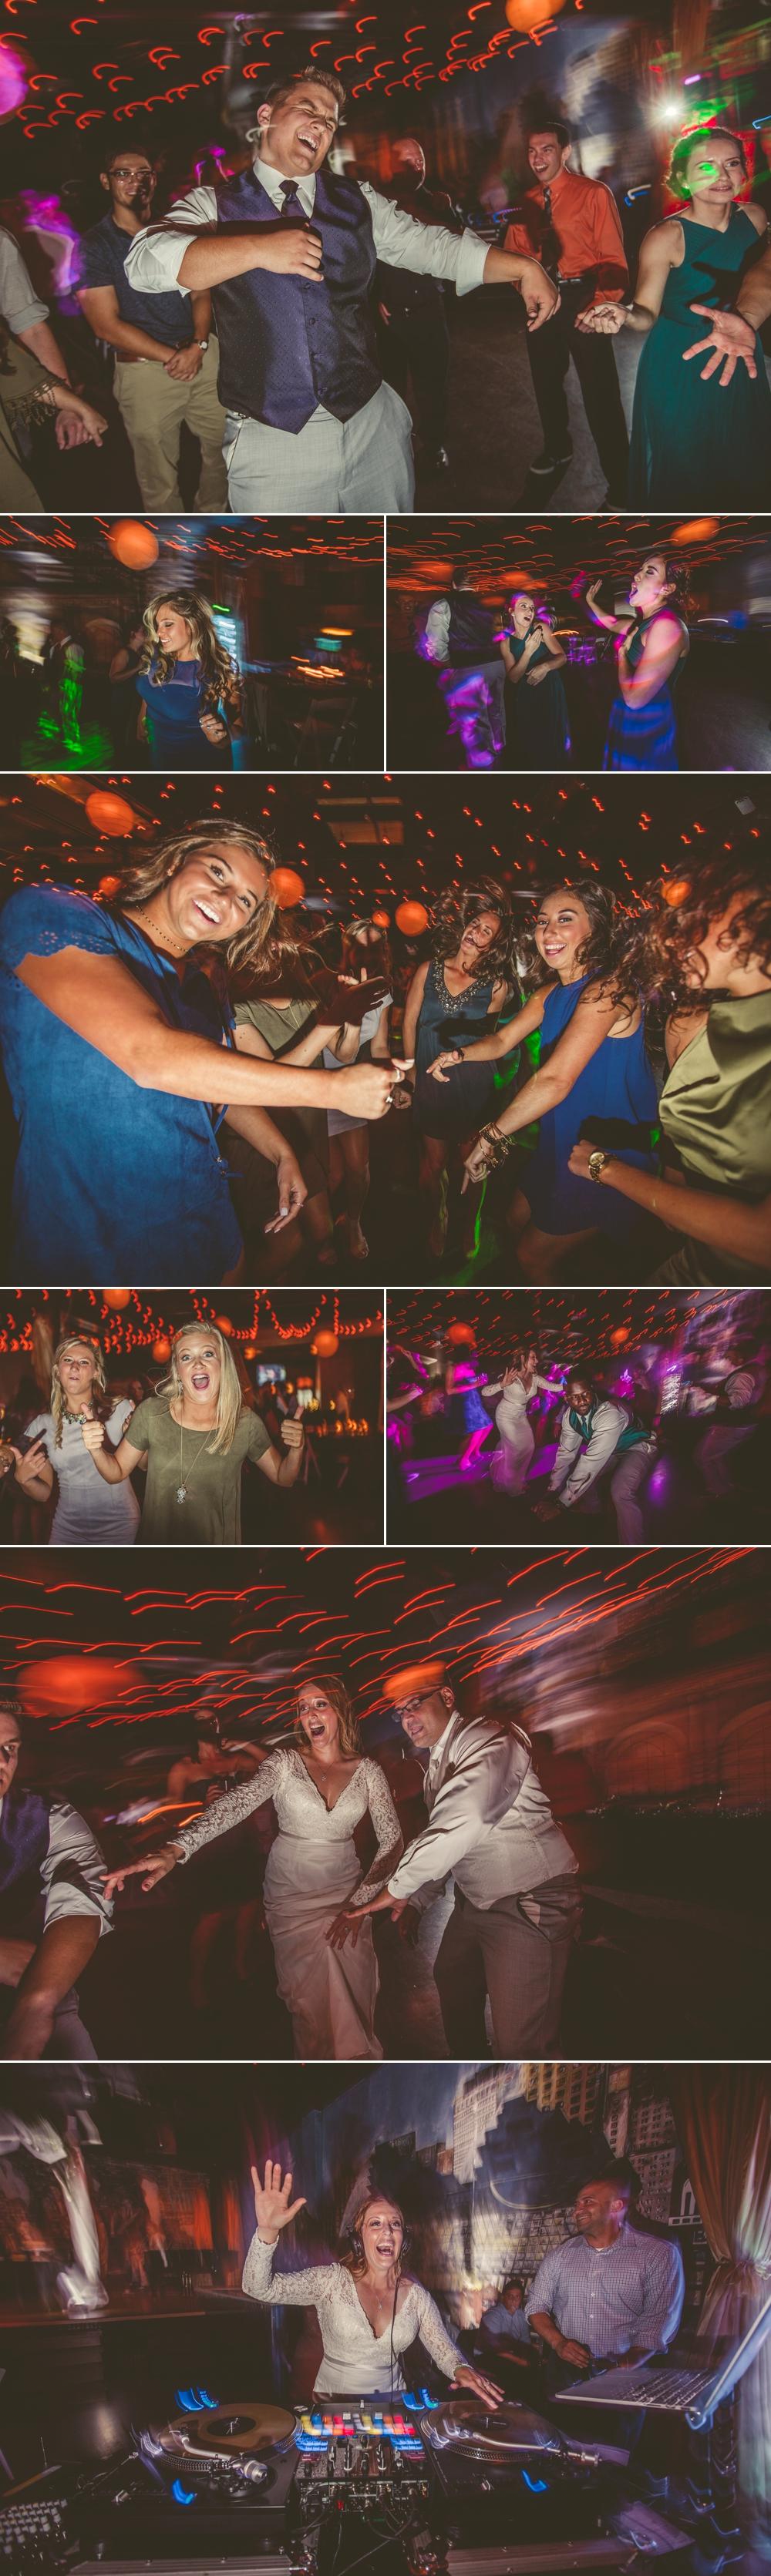 jason_domingues_photography_best_kansas_city_photographer_kc_weddings_28_event_space_0004